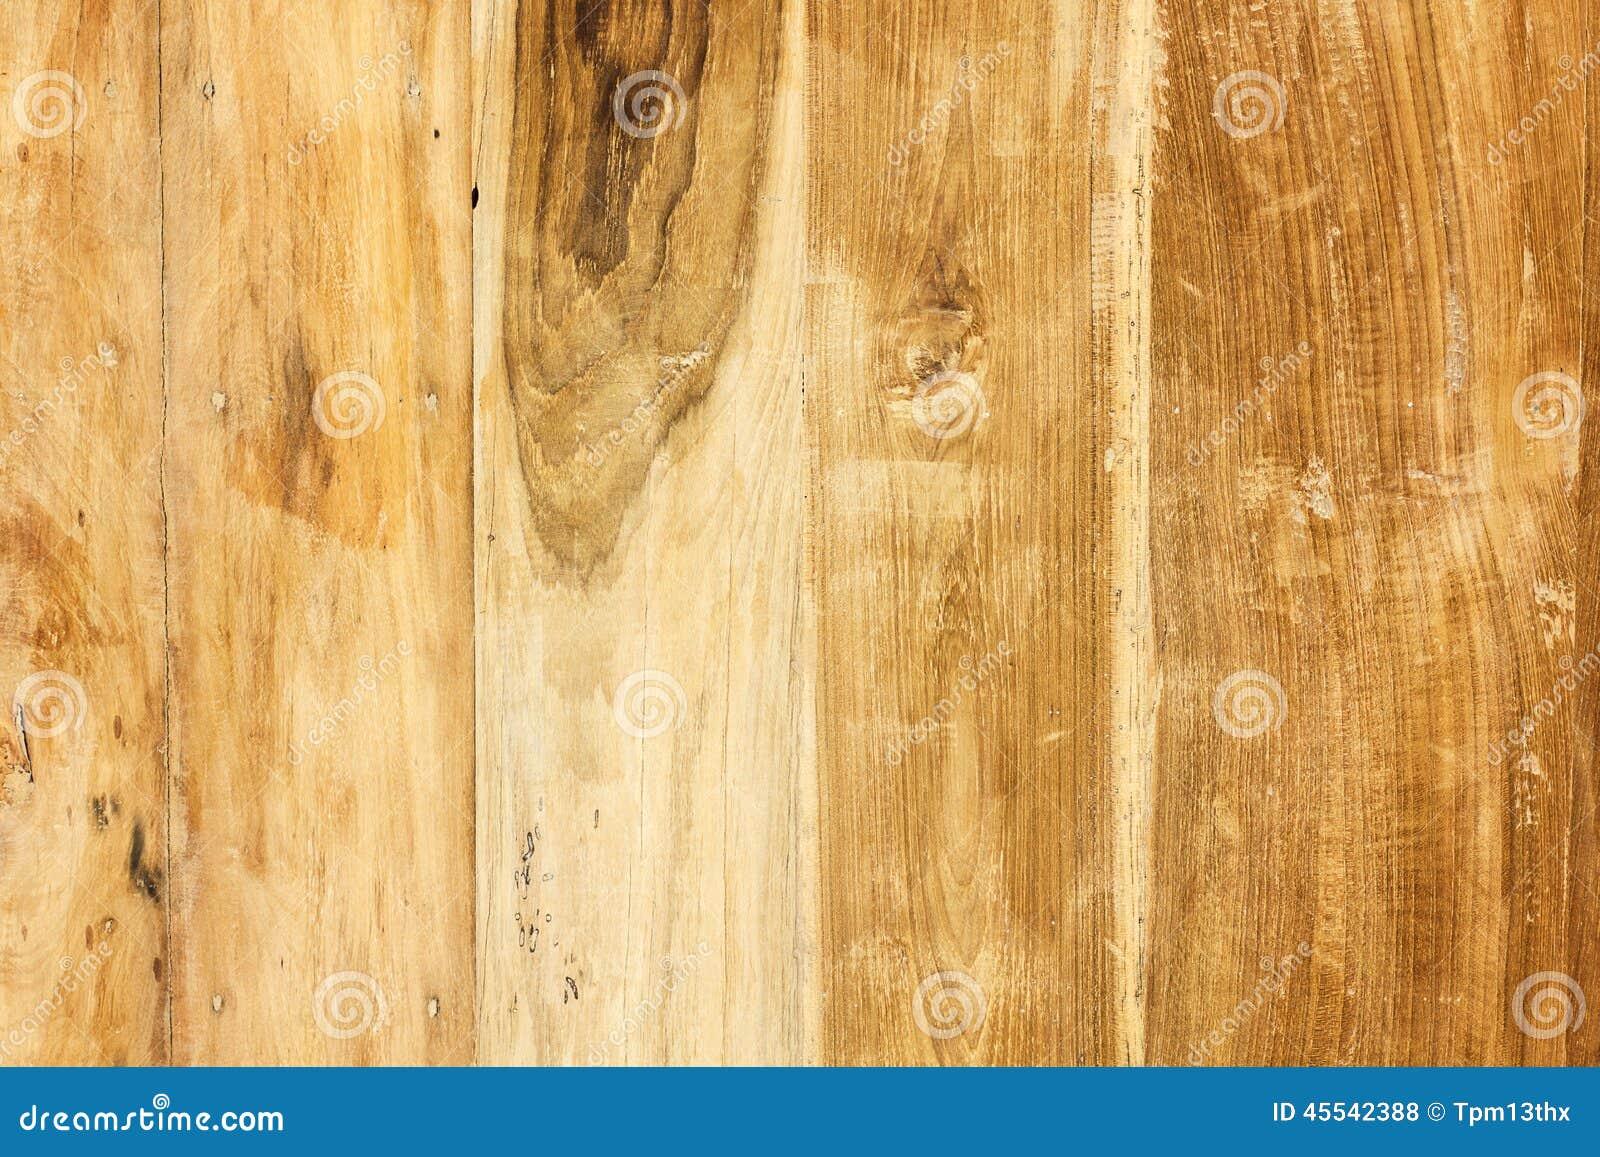 Realistic dark teak wood texture stock photo image of